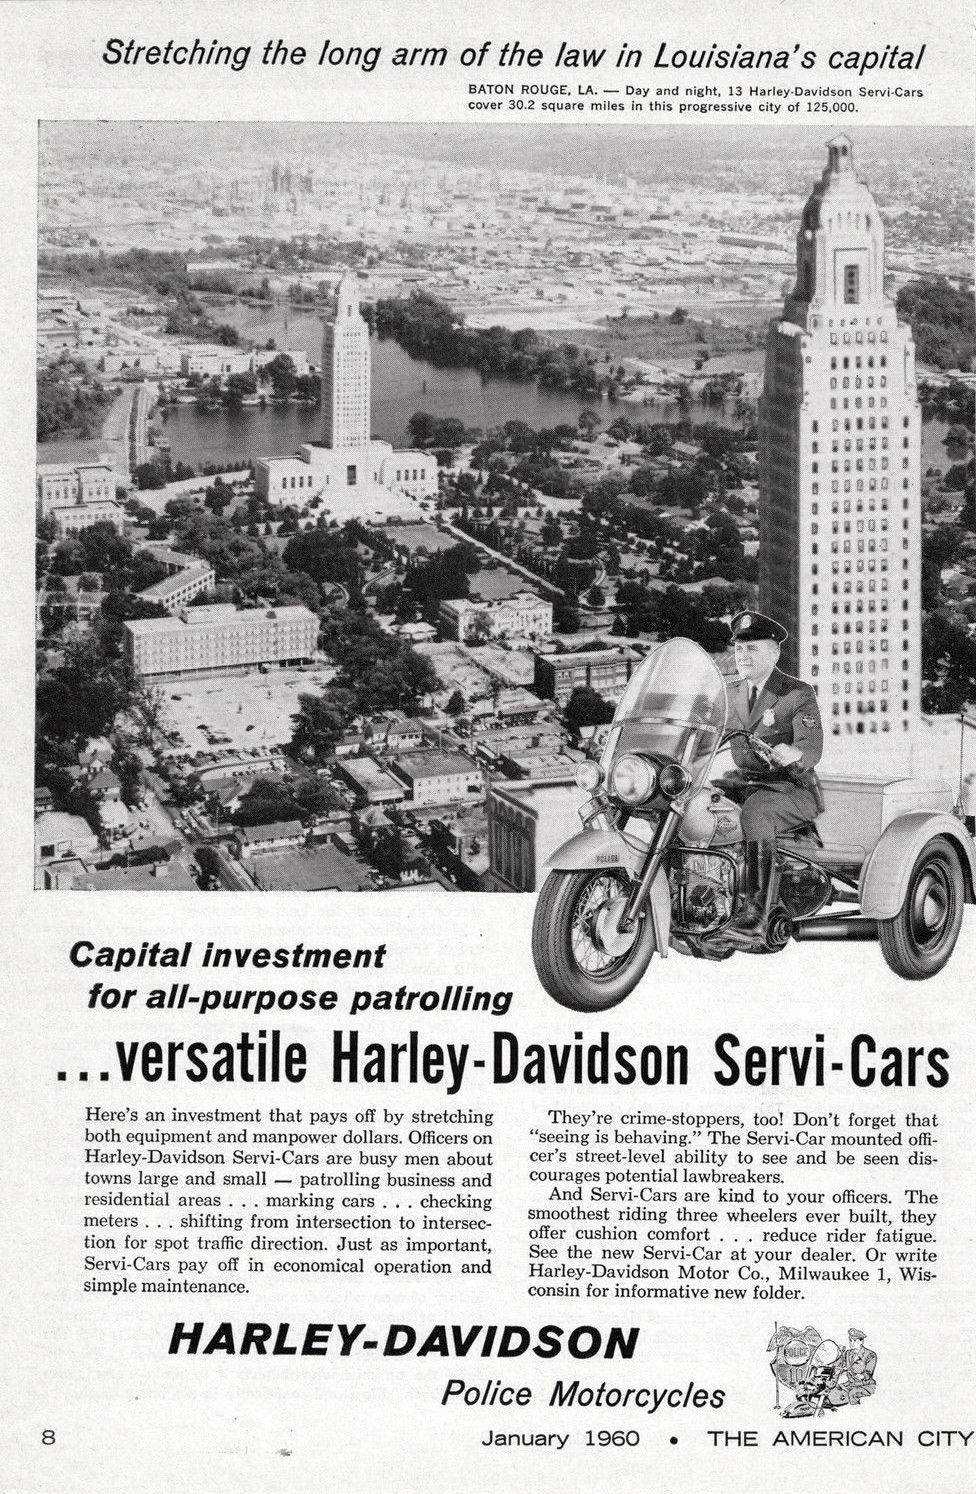 Versatile Servi-Cars